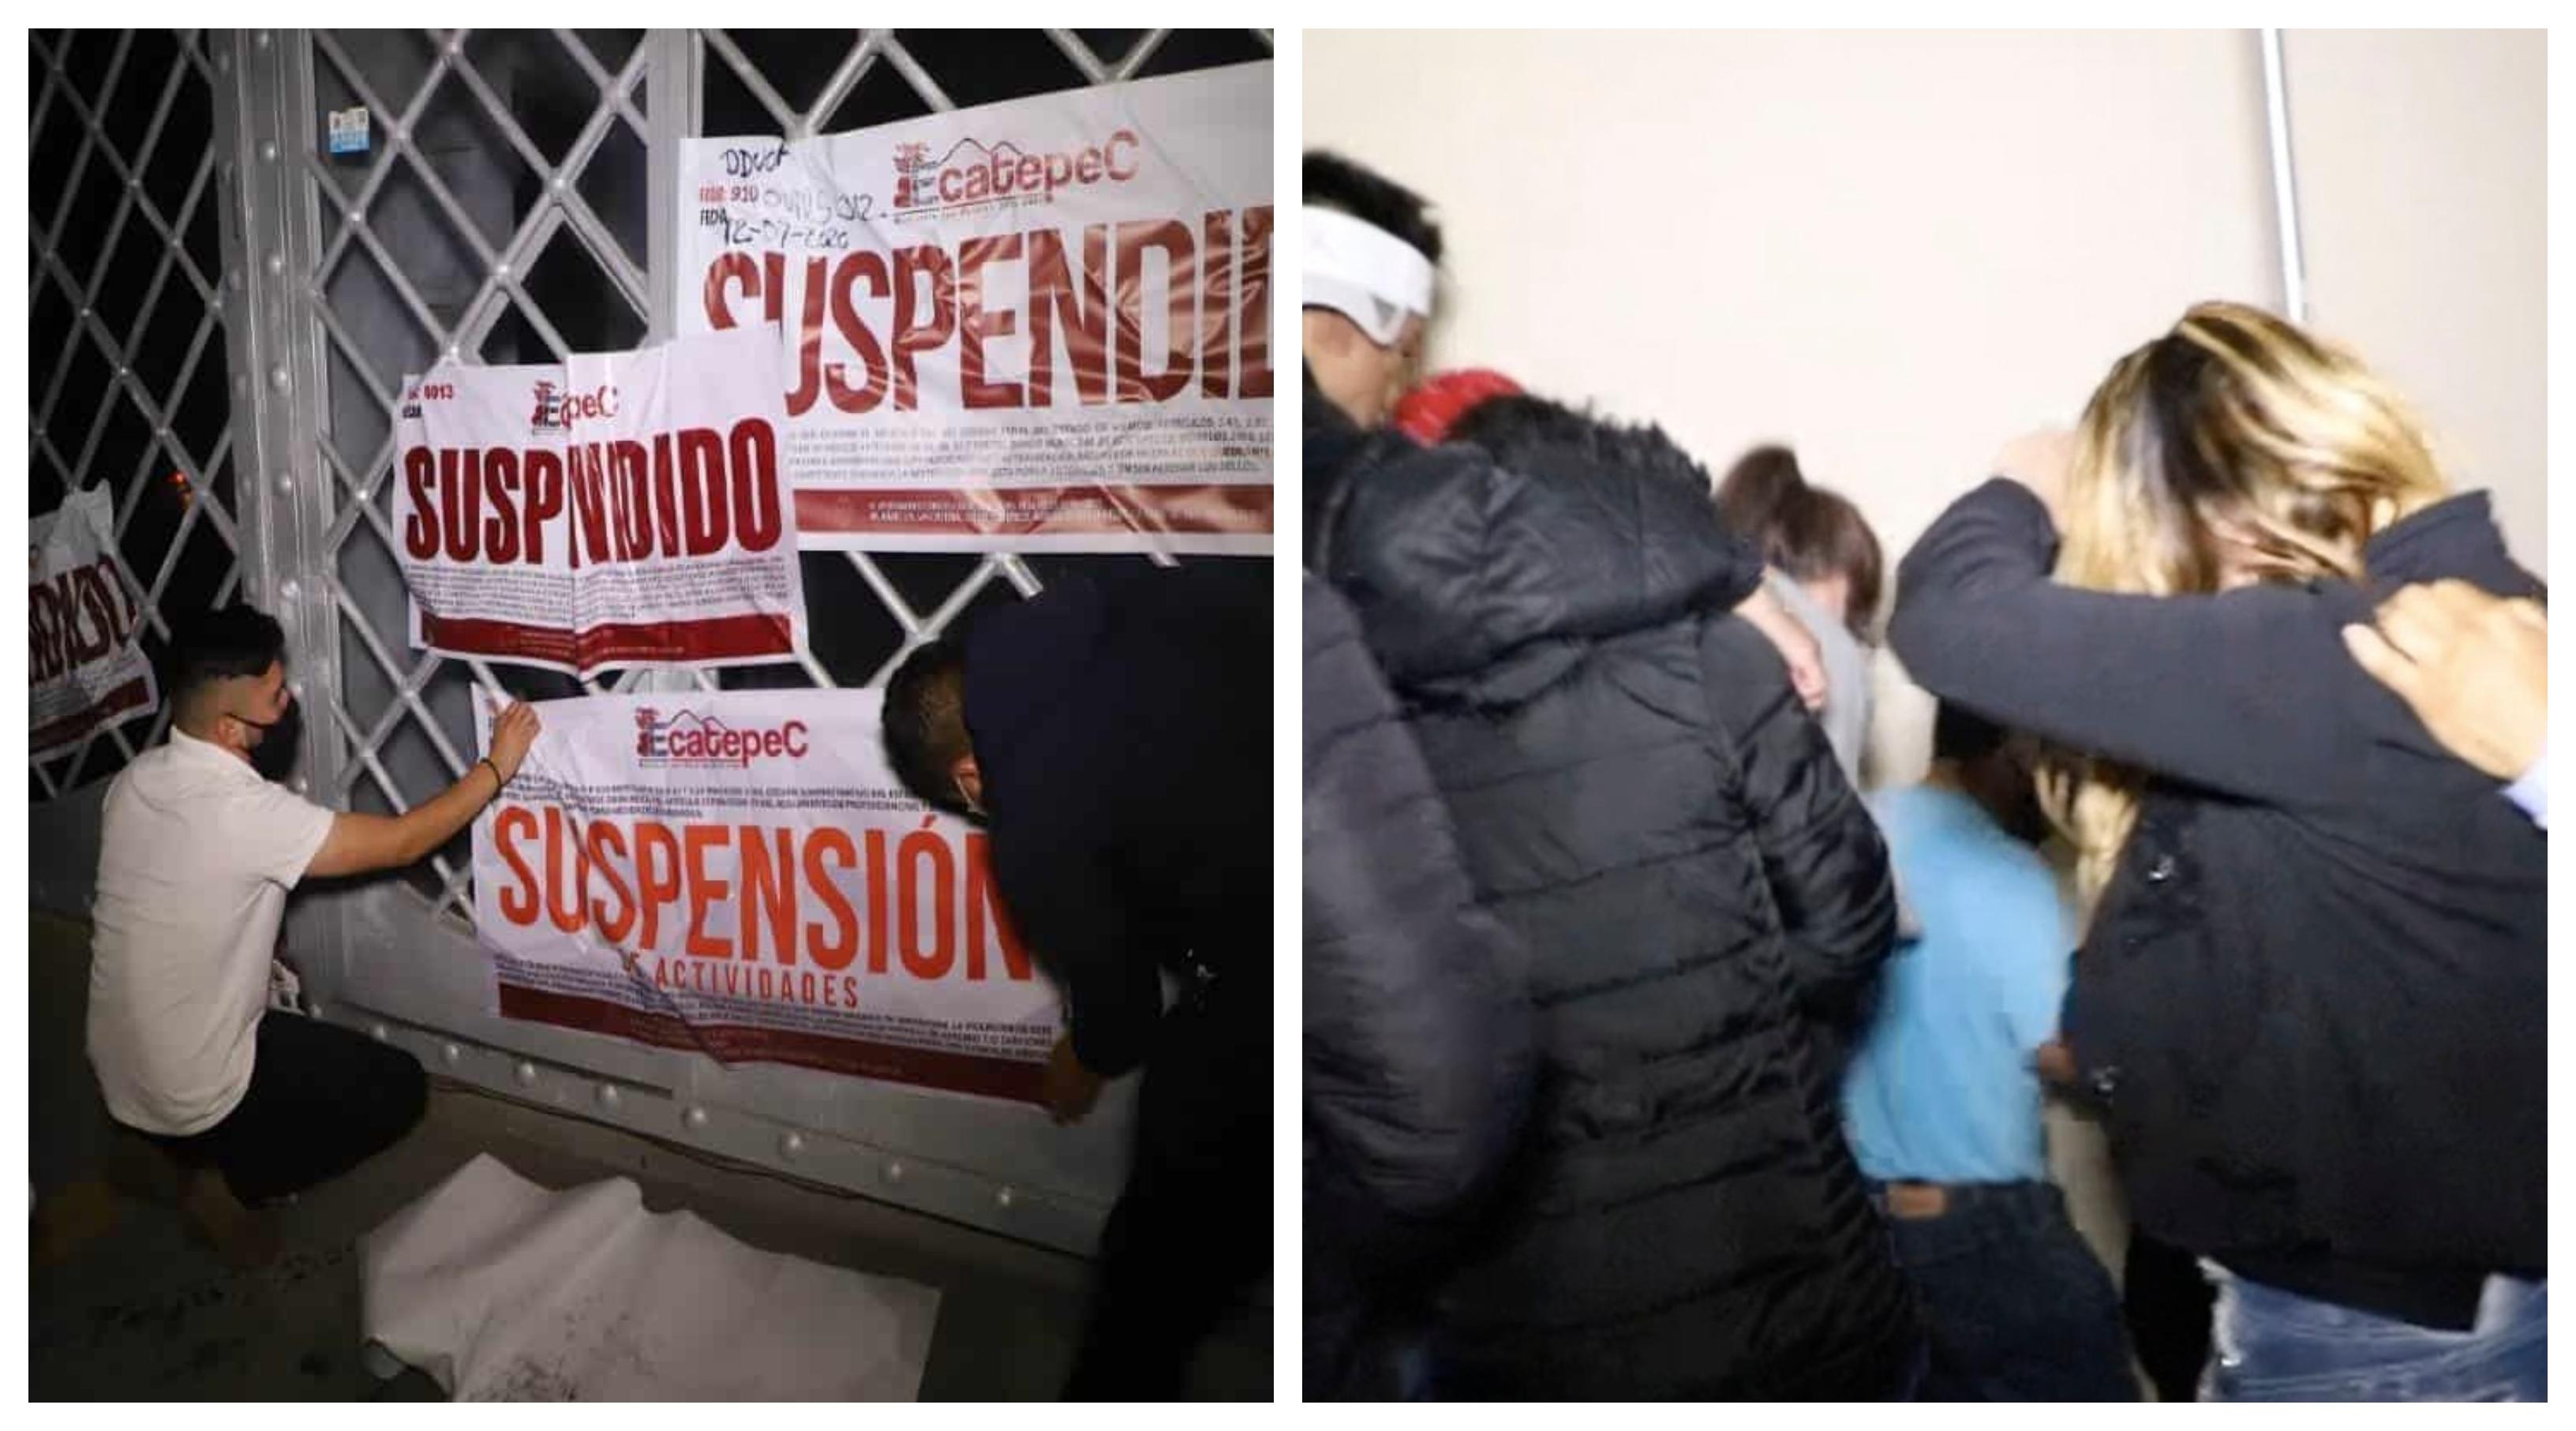 En pleno bailongo, cancelan sonidero en Ecatepec